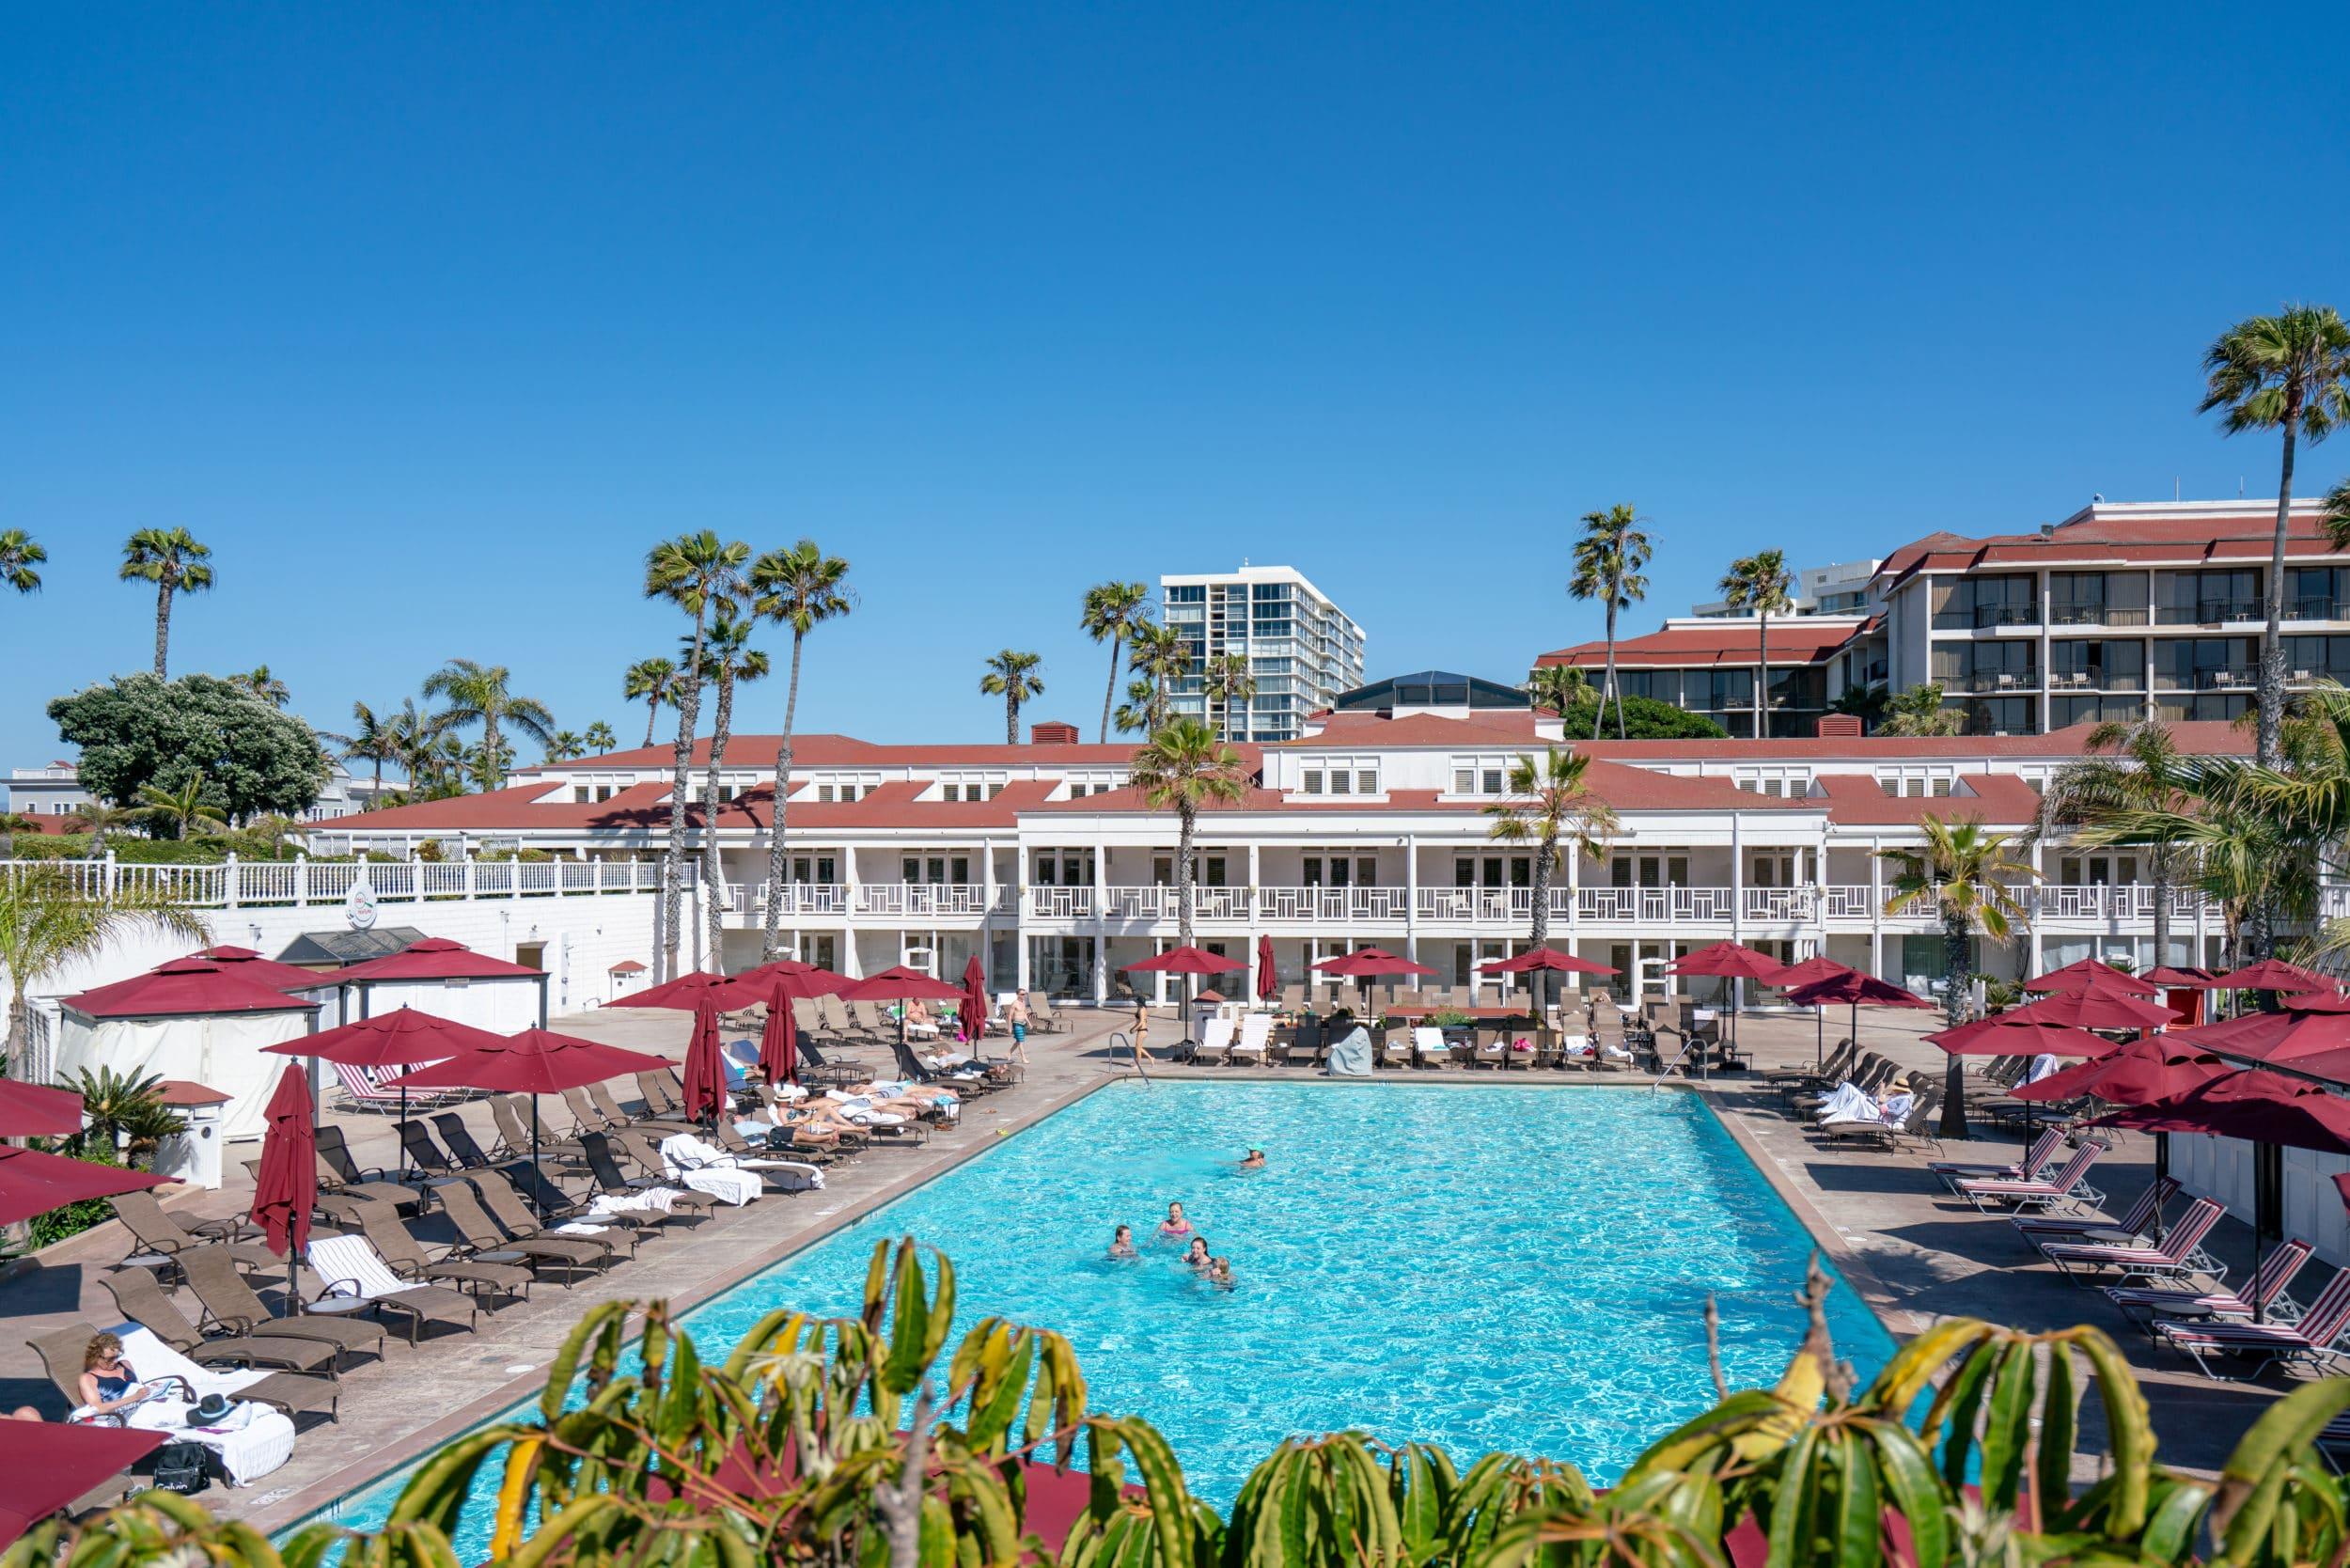 Cabana rooms at Hotel Del Coronado